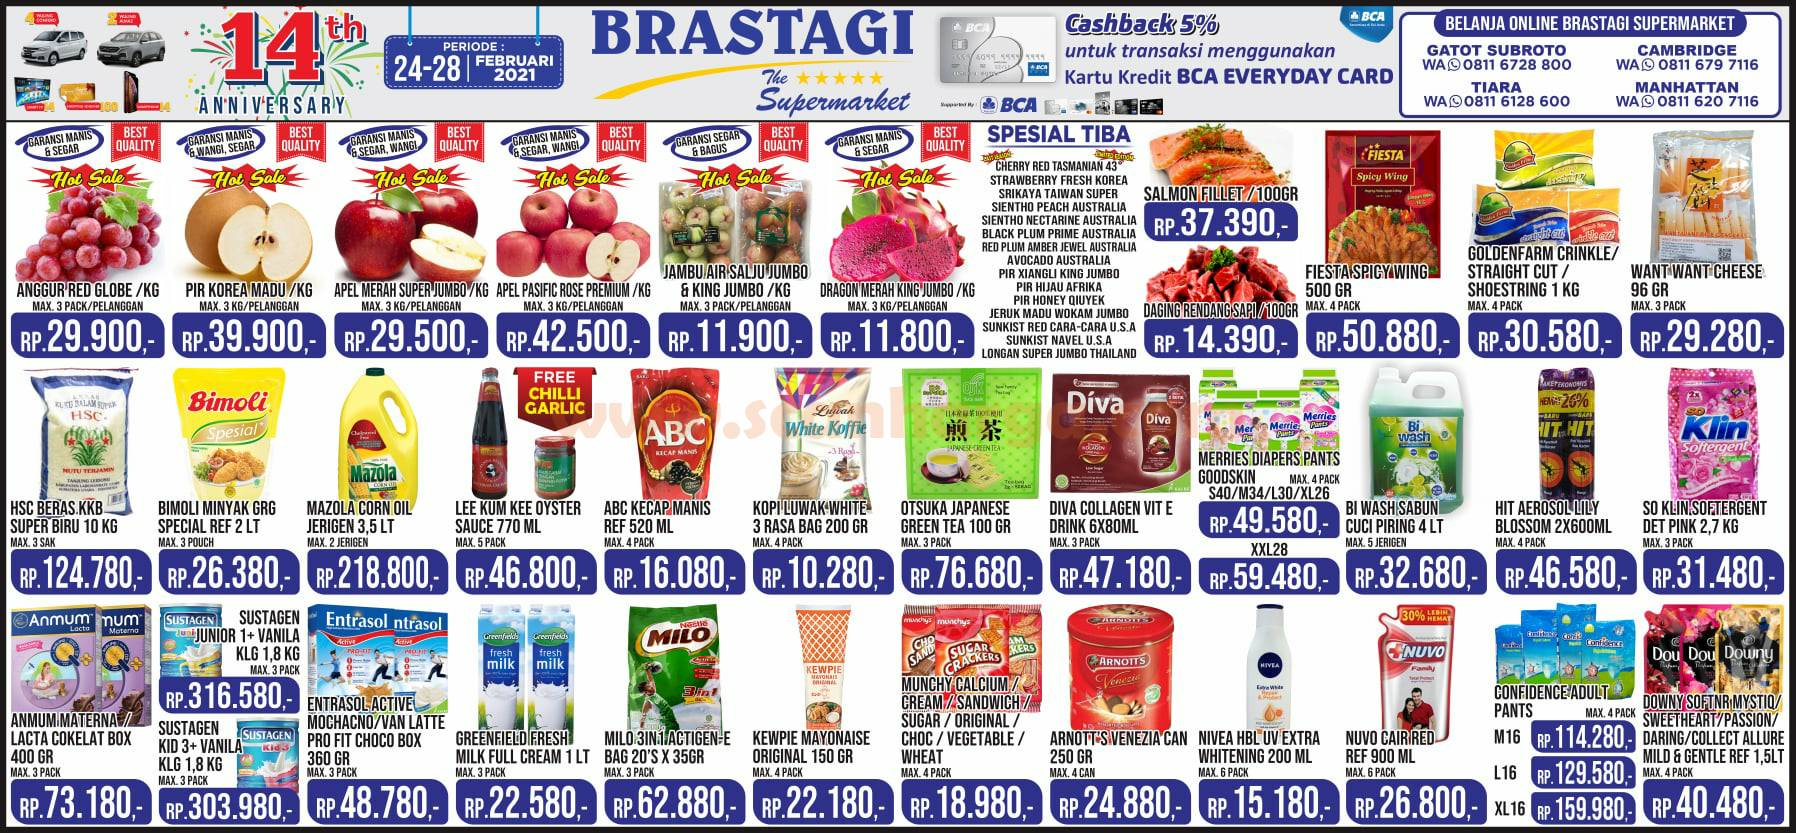 Katalog Promo JSM Brastagi Weekend 24 - 28 Februari 2021